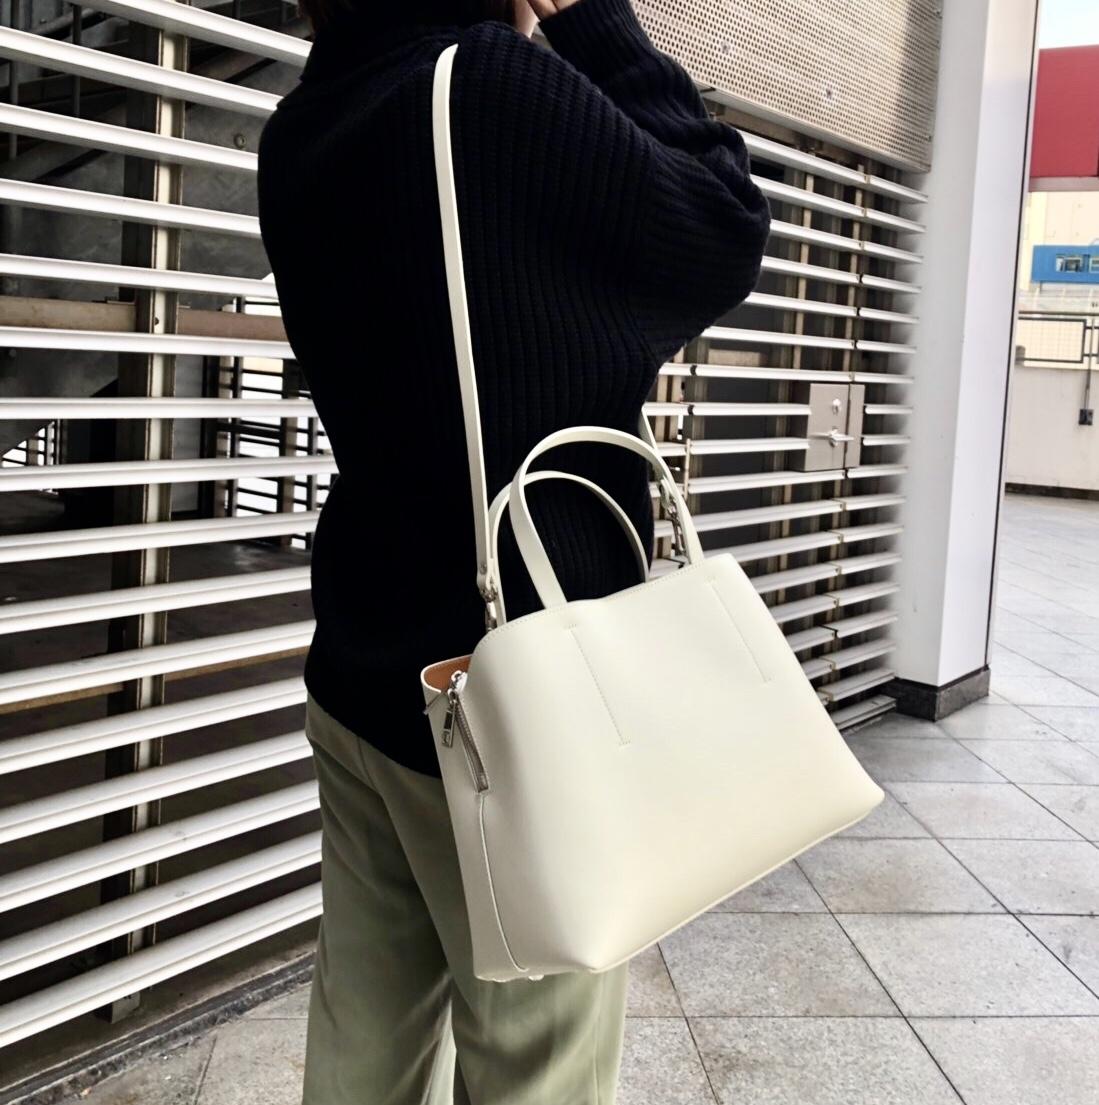 MILOS ミロス scrapbook スクラップ ブック バッグ bag トートバッグ ショルダーバッグ 牛革 東武池袋 池袋東武 東武百貨店